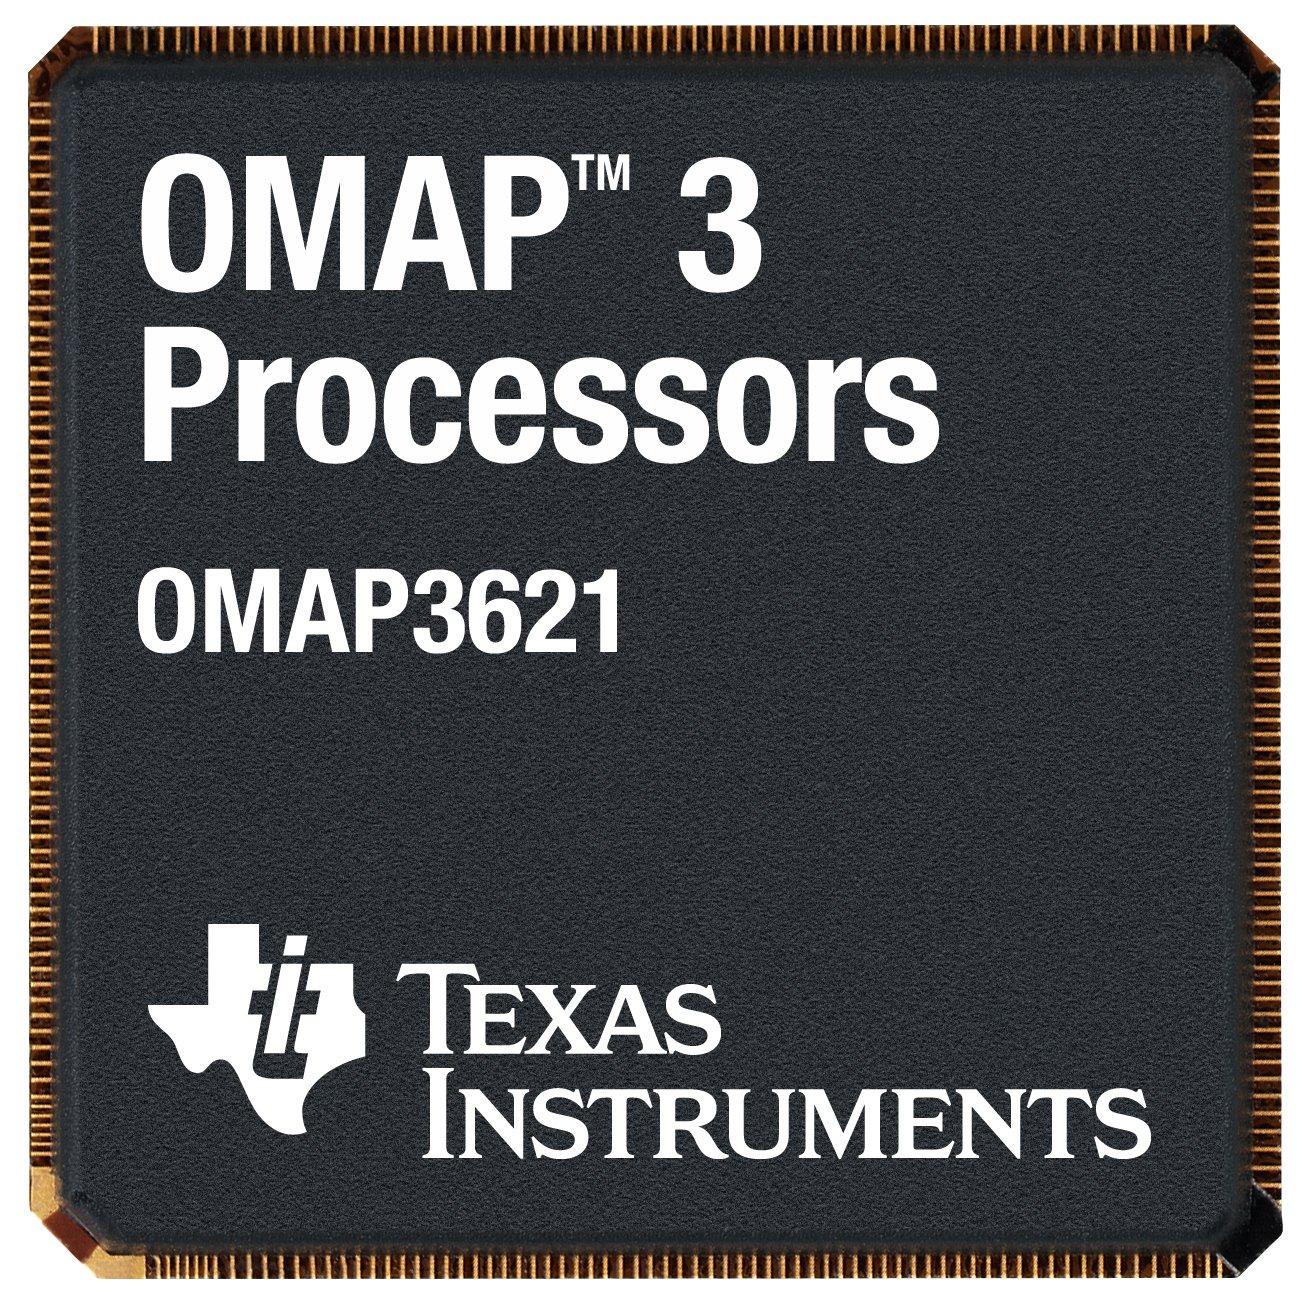 OMAP3621